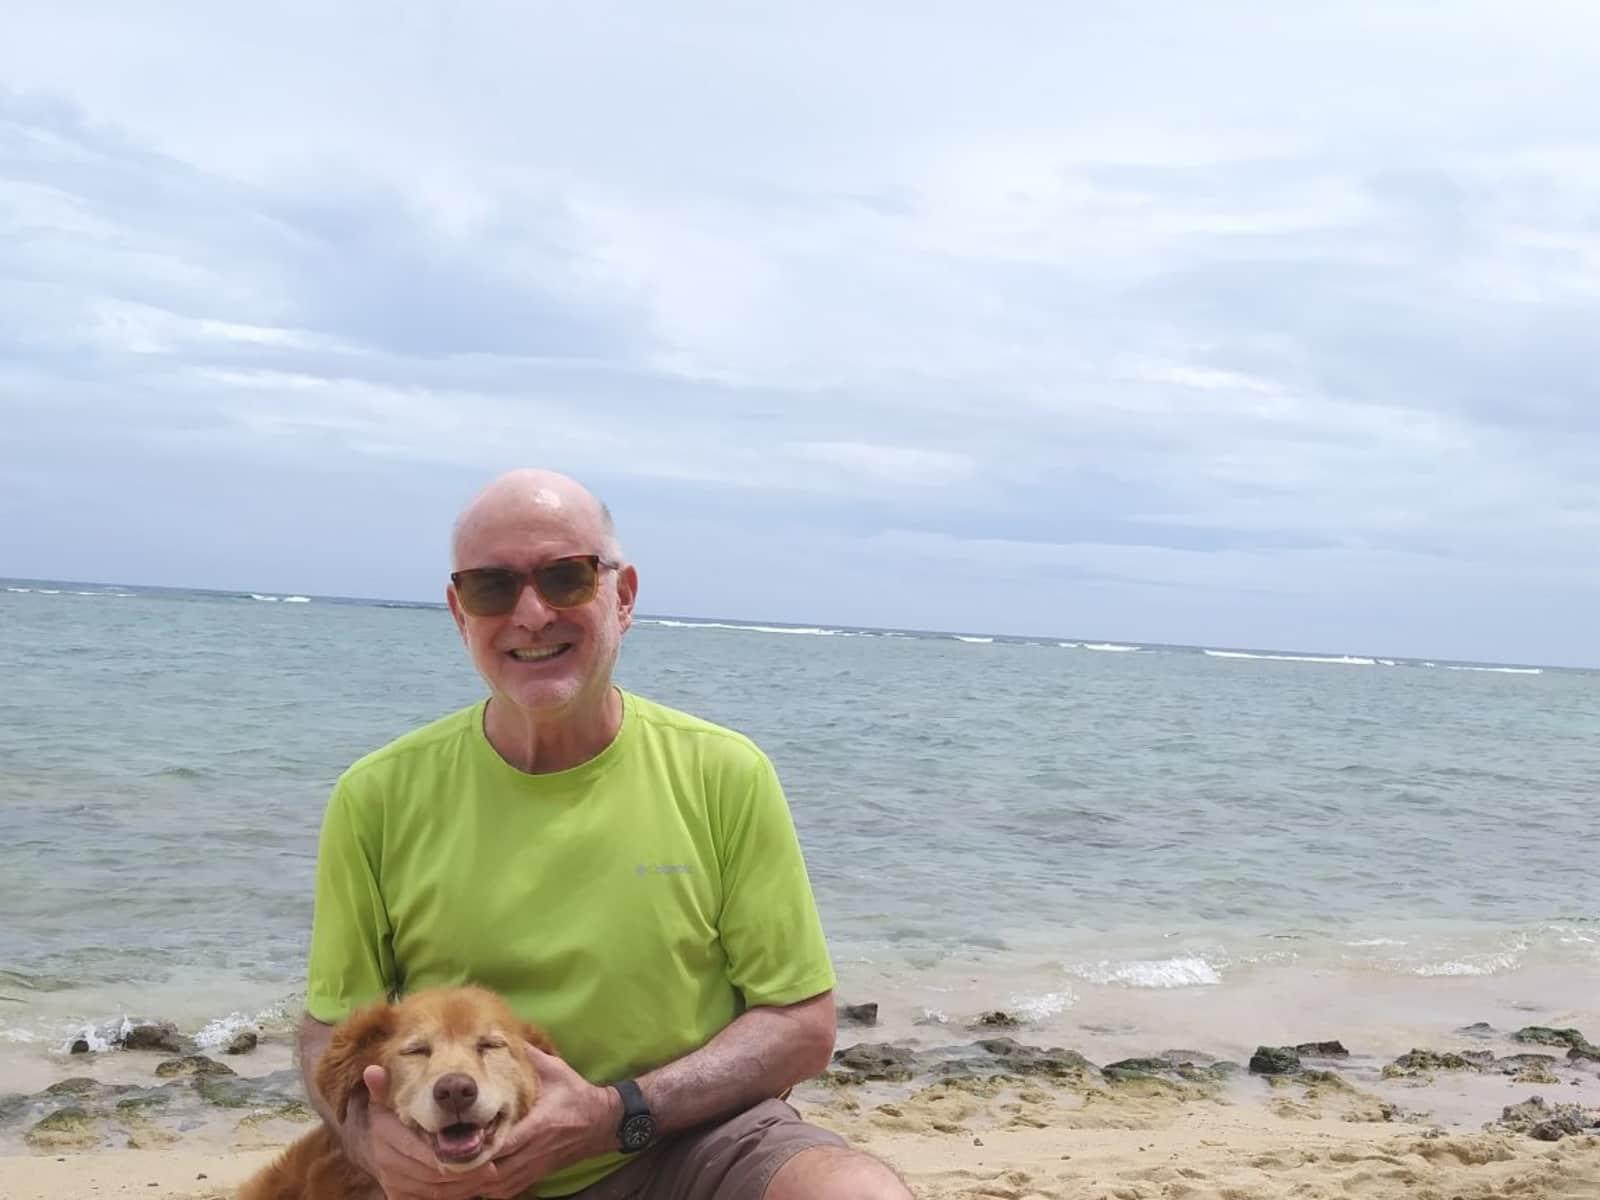 Jim from Honolulu, Hawaii, United States